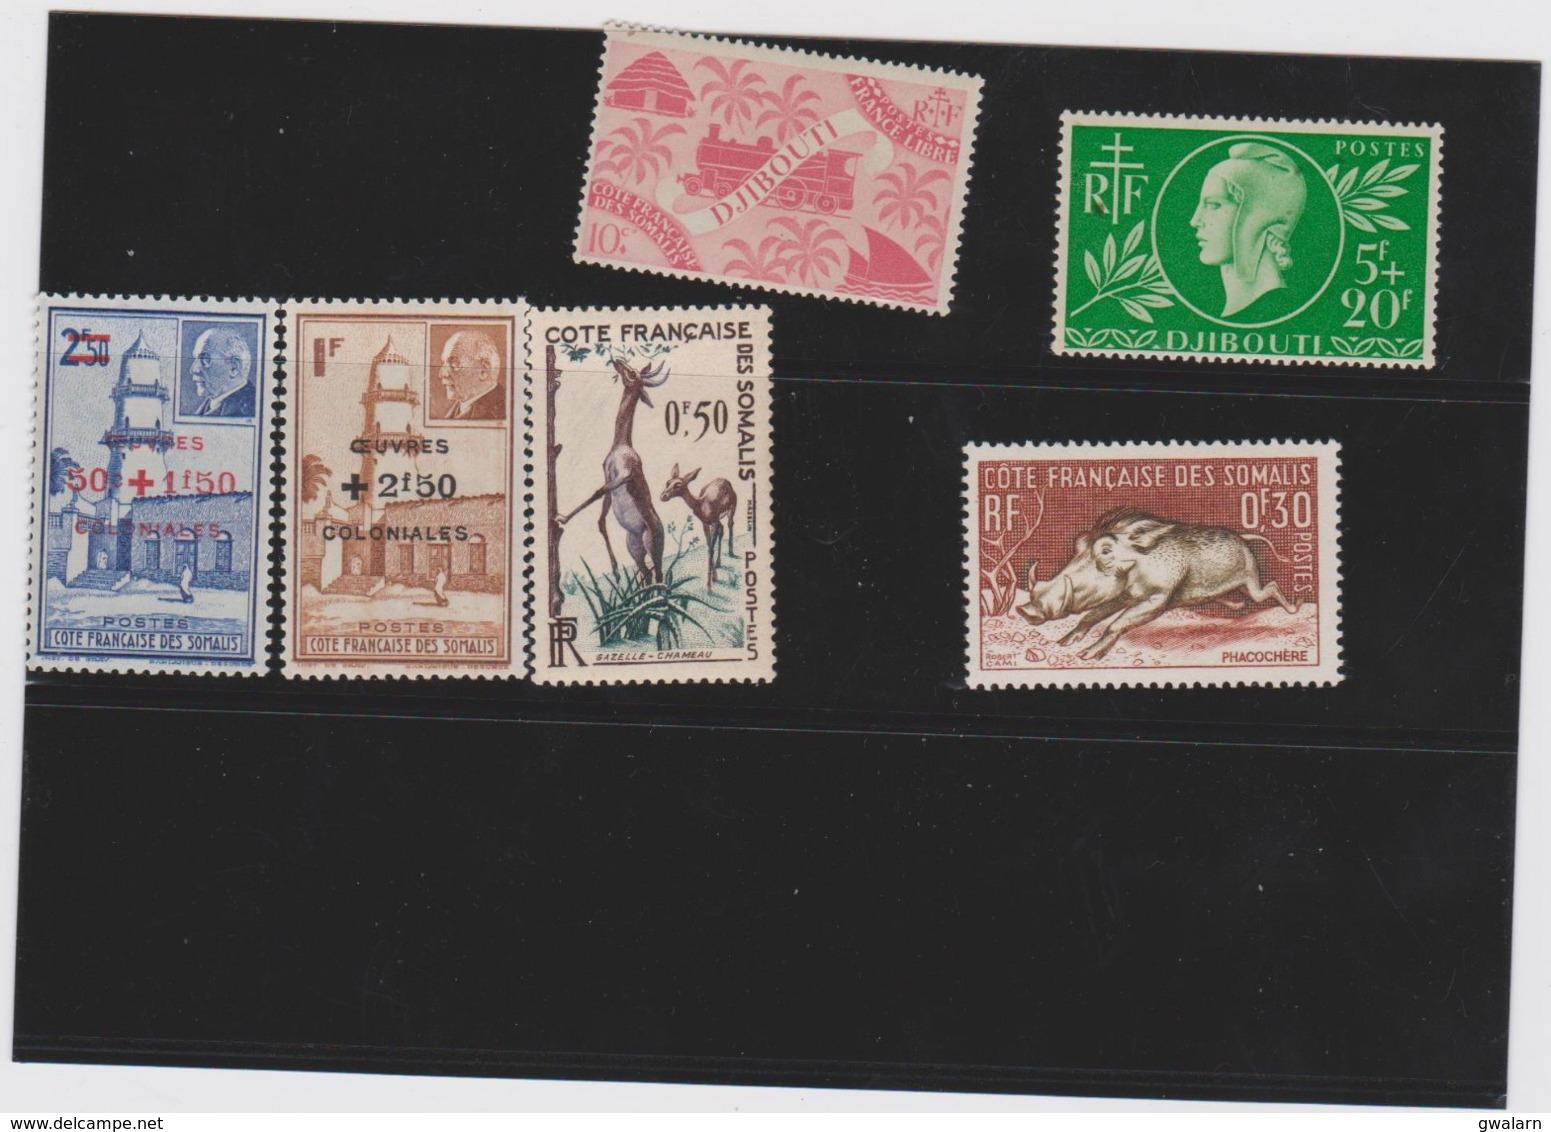 COLONIES FRANCAISES COTE DES SOMALIS (Djibouti) 6 Timbres Neufs Xx 235 251 252 253 287 289 - Costa Francesa De Somalia (1894-1967)